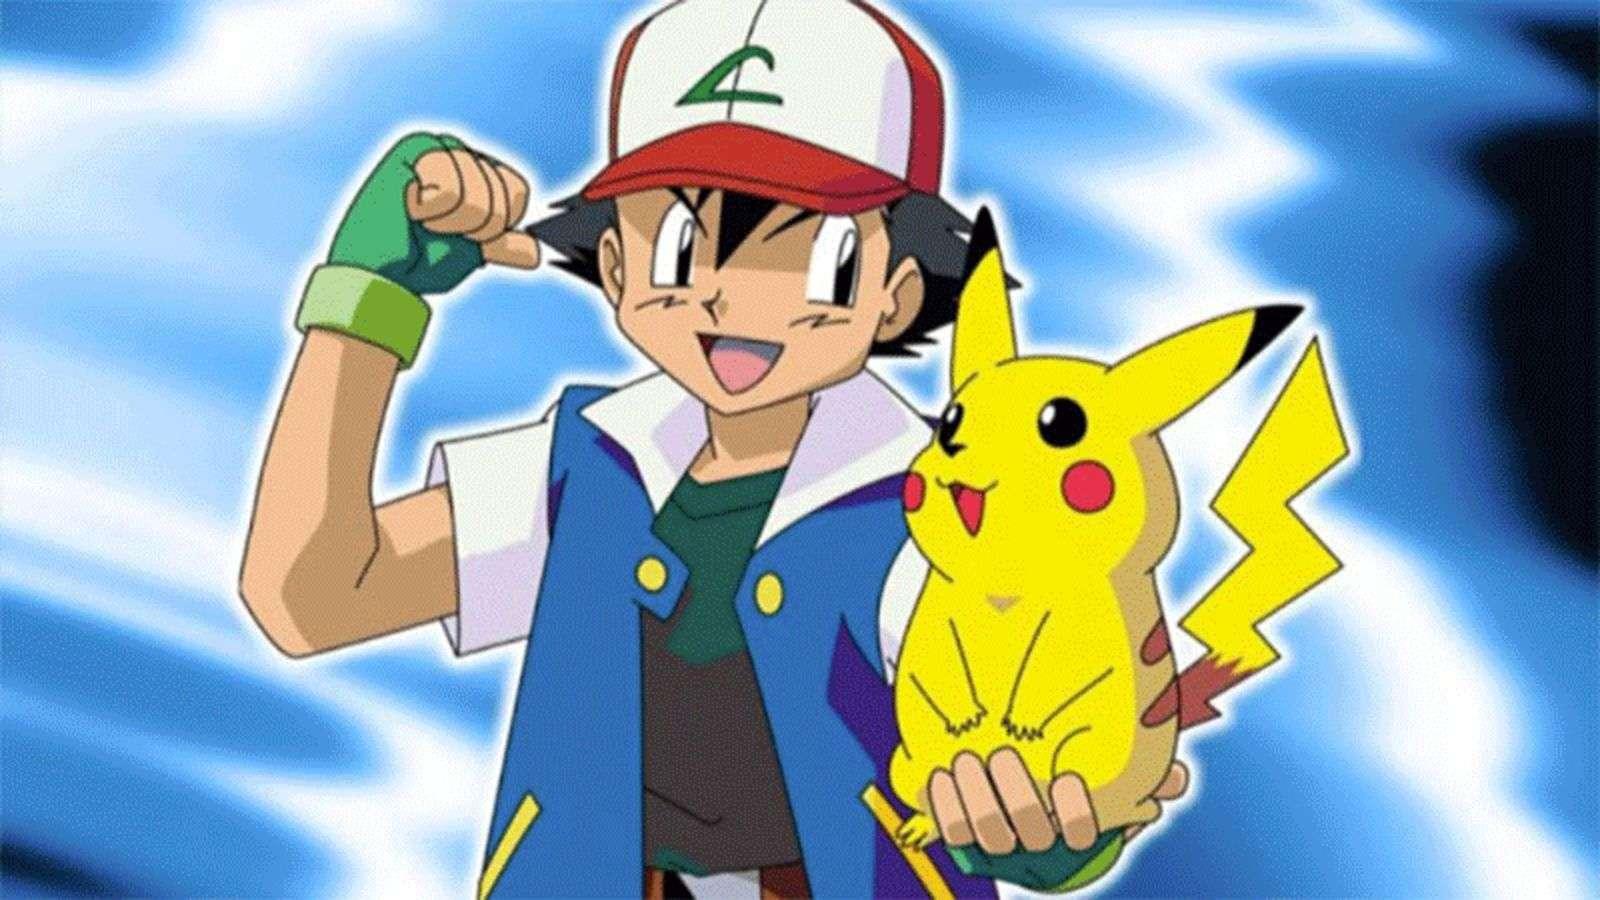 The Banned Pokemon Episode That Gave Children Seizures